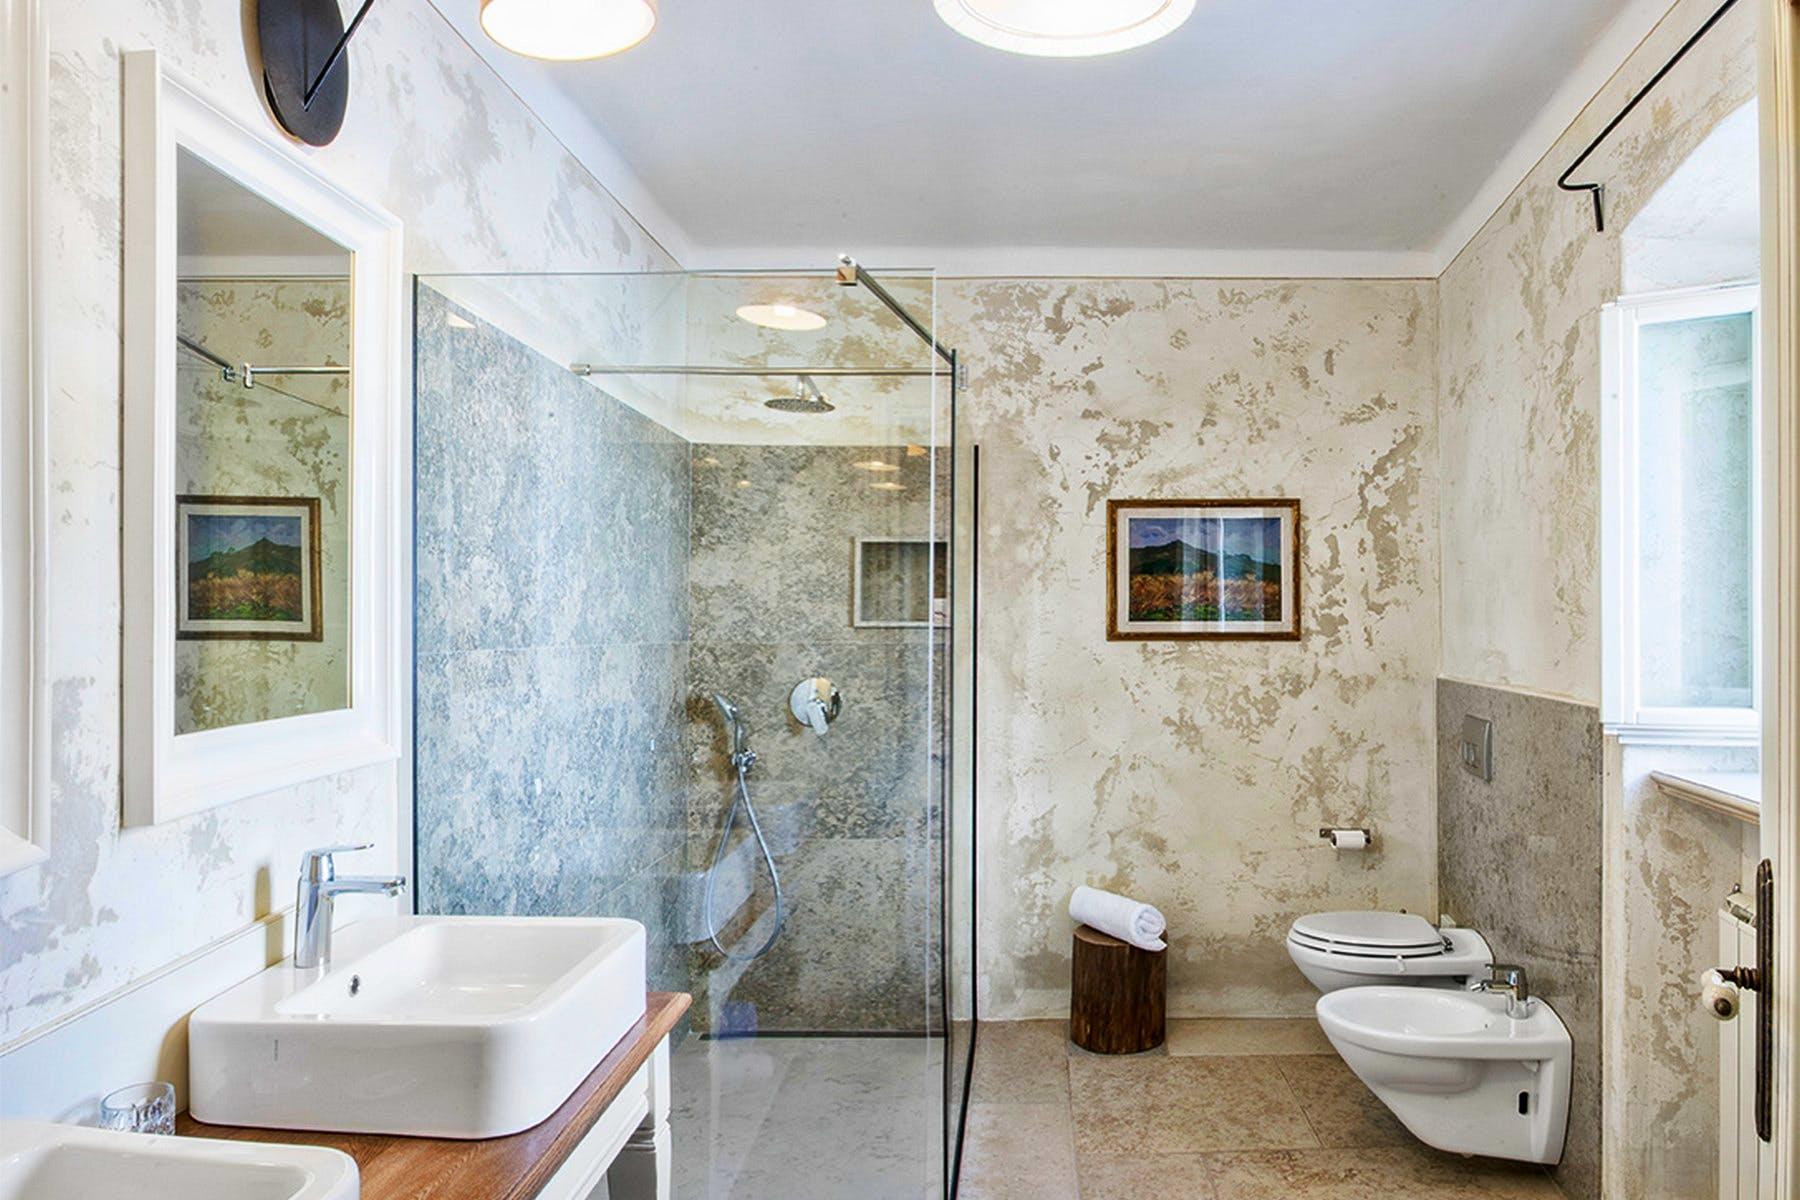 Bathroom area with modern amenities